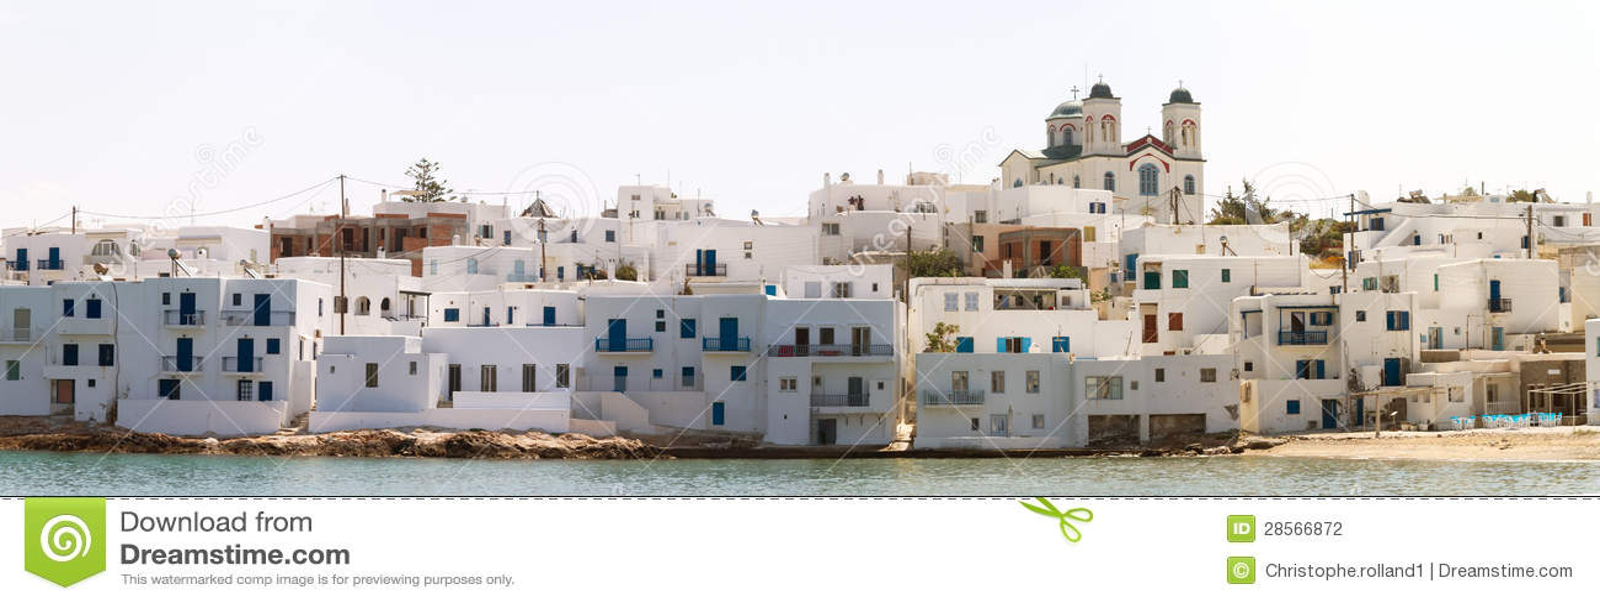 Haven van Naoussa, Paros eiland, Griekenland